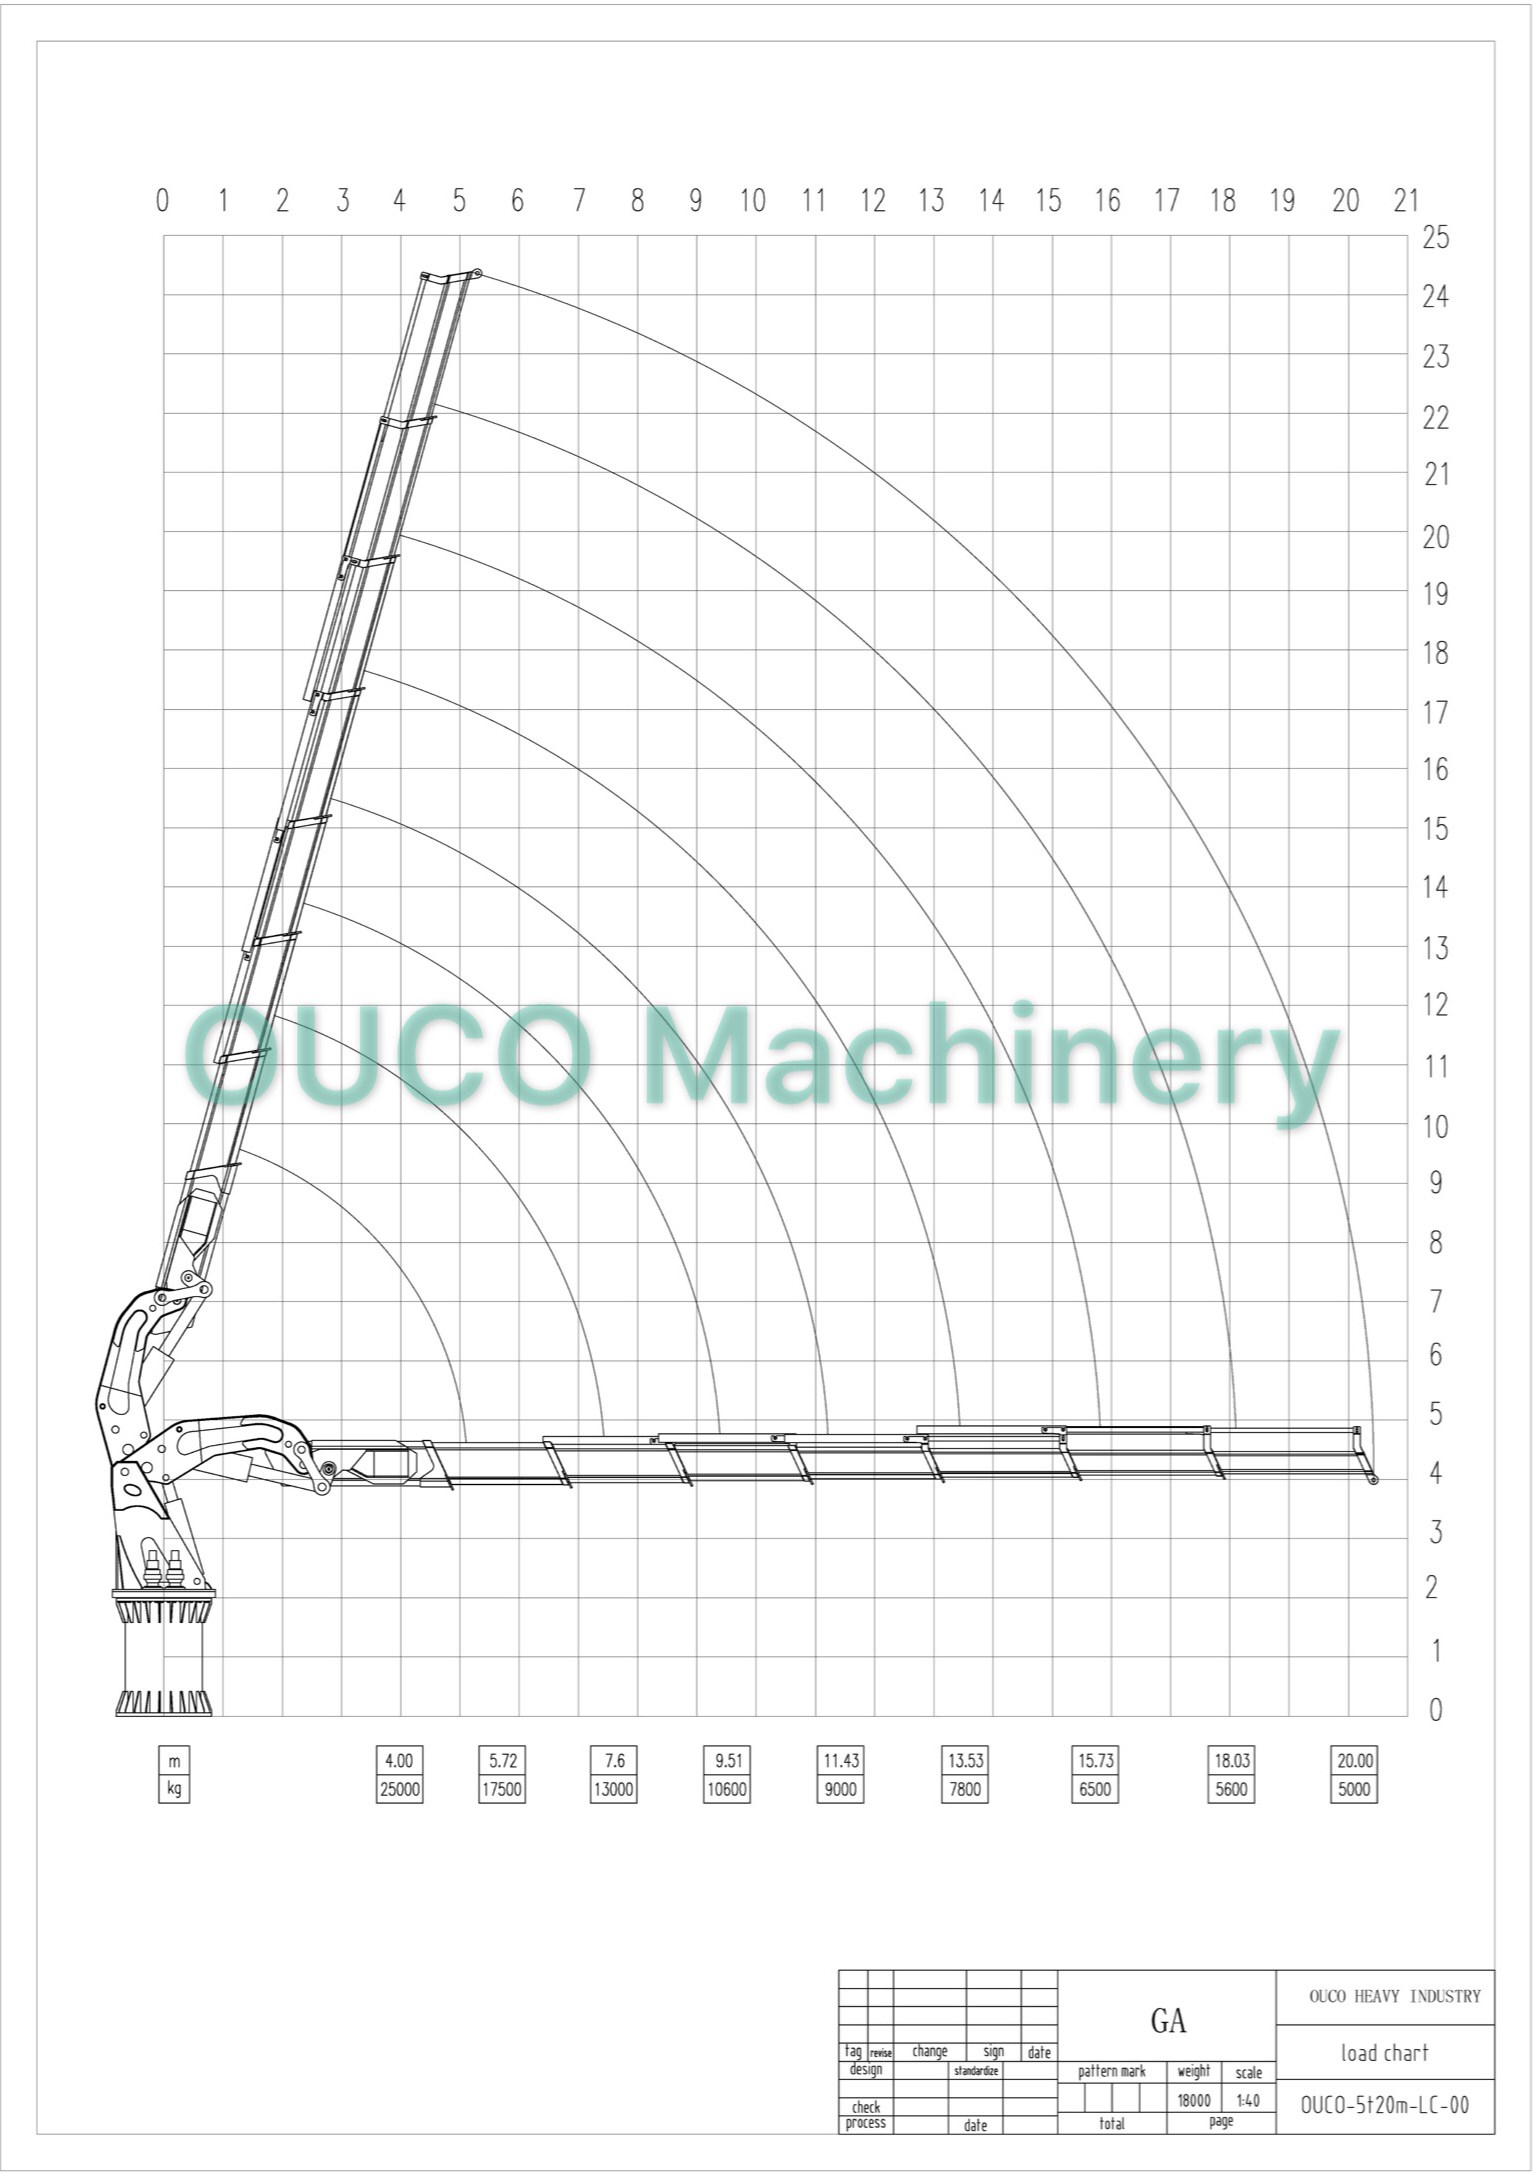 OUCO Marine crane 5T20M folding boom crane